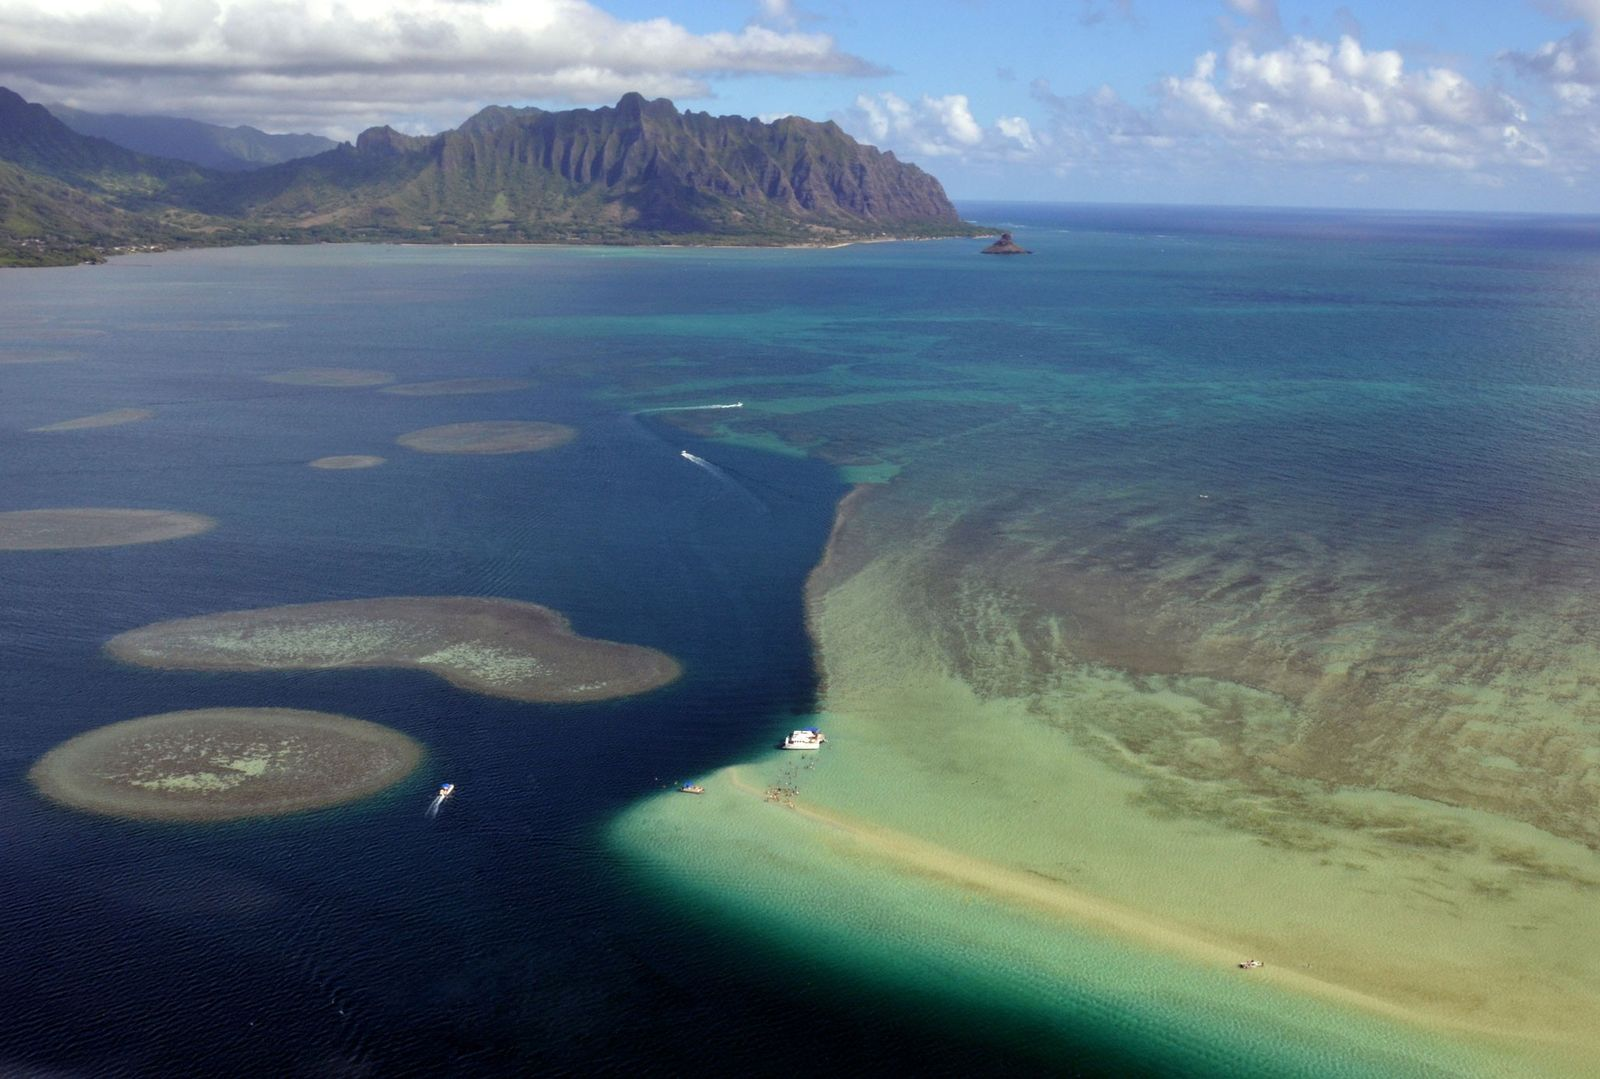 Hawaii Enlists Urchins to Help Corals Resist Algae Invasion